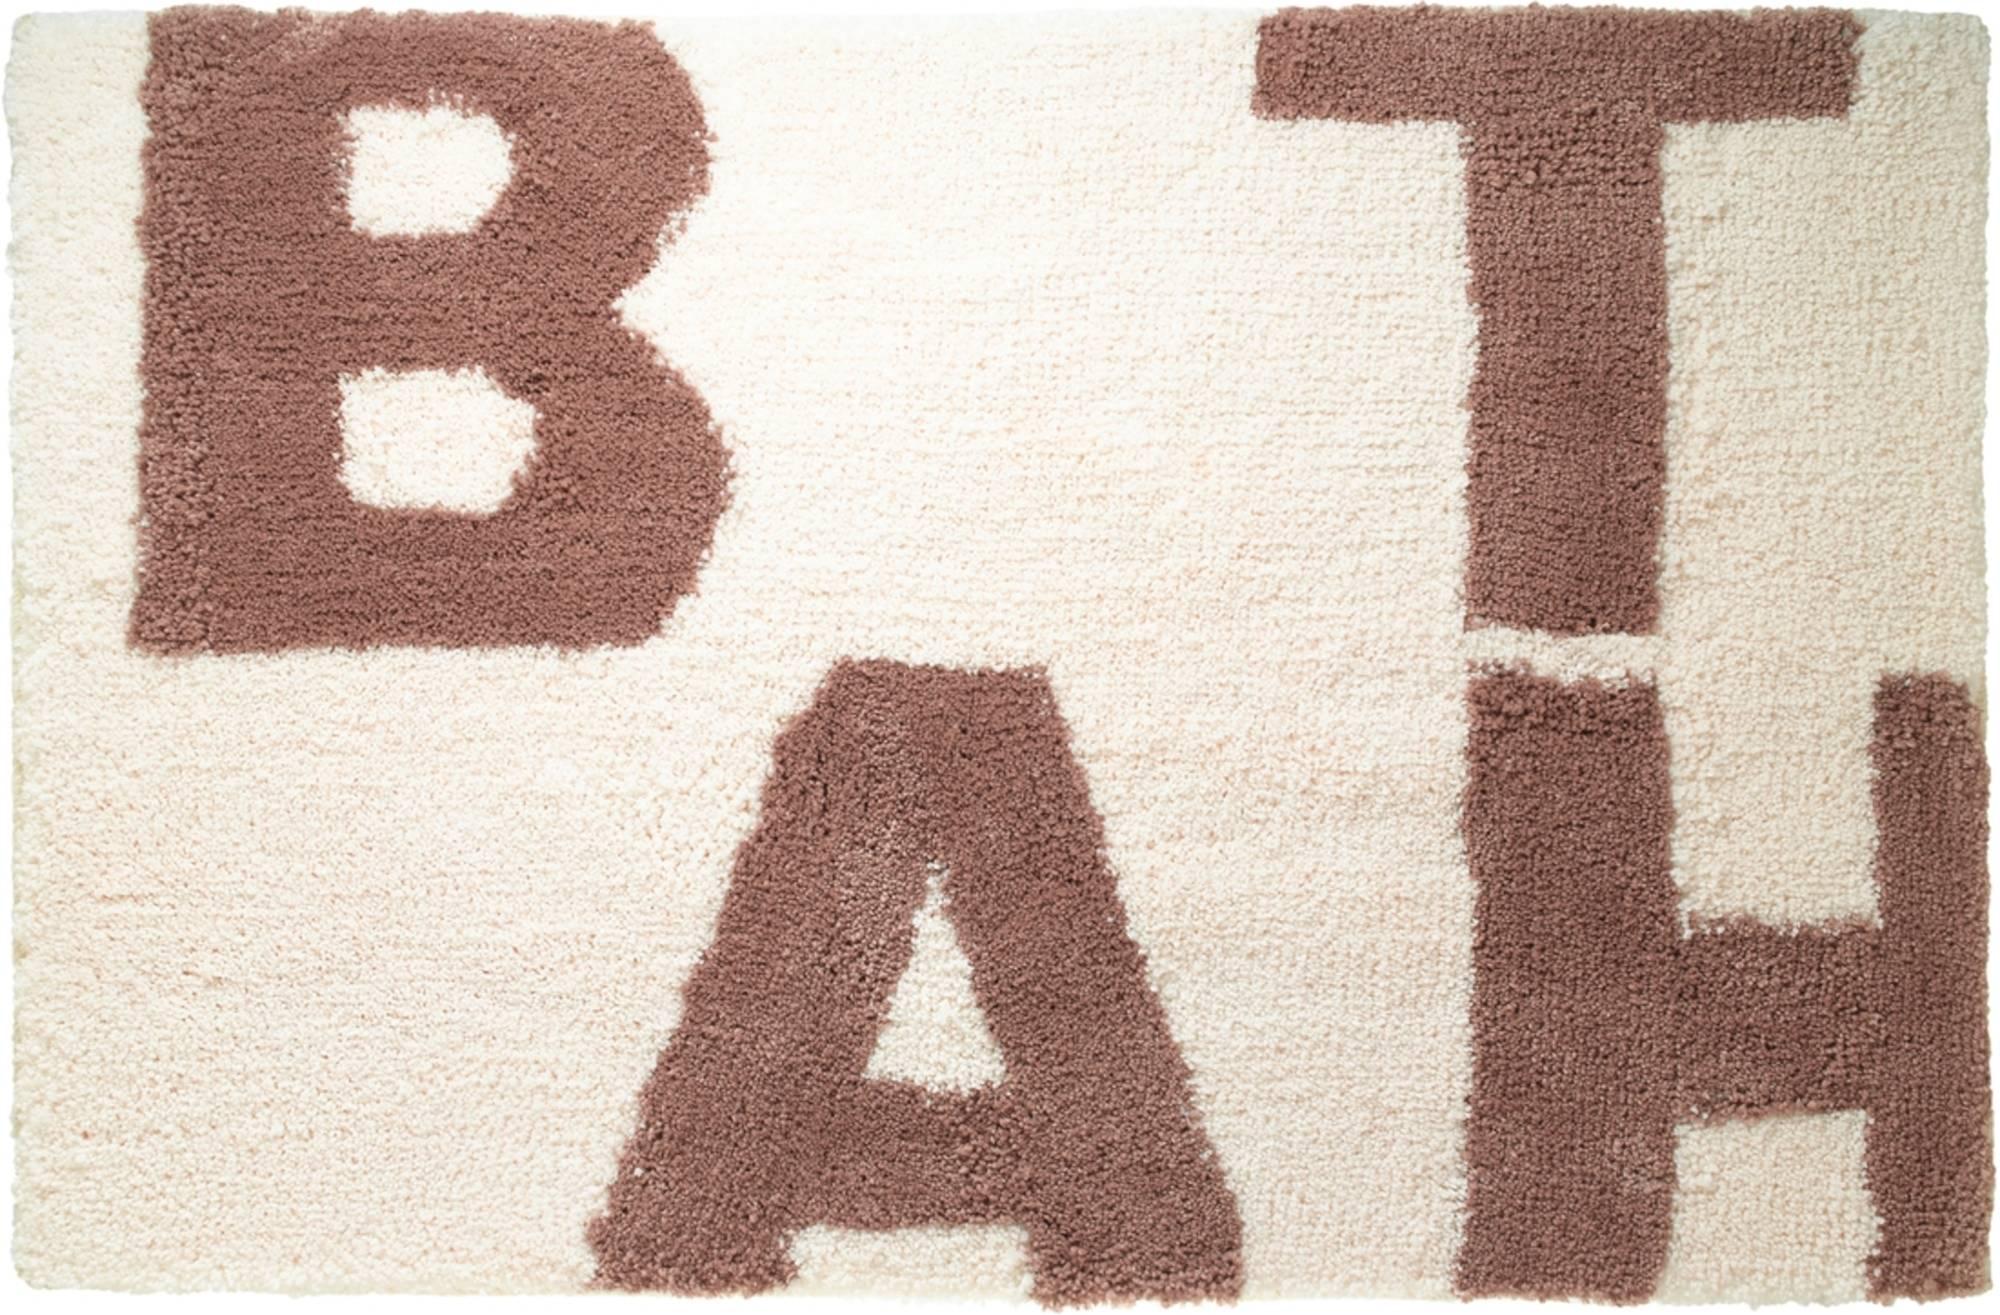 Sealskin littera badmat 90x60cm polyester Ivoor